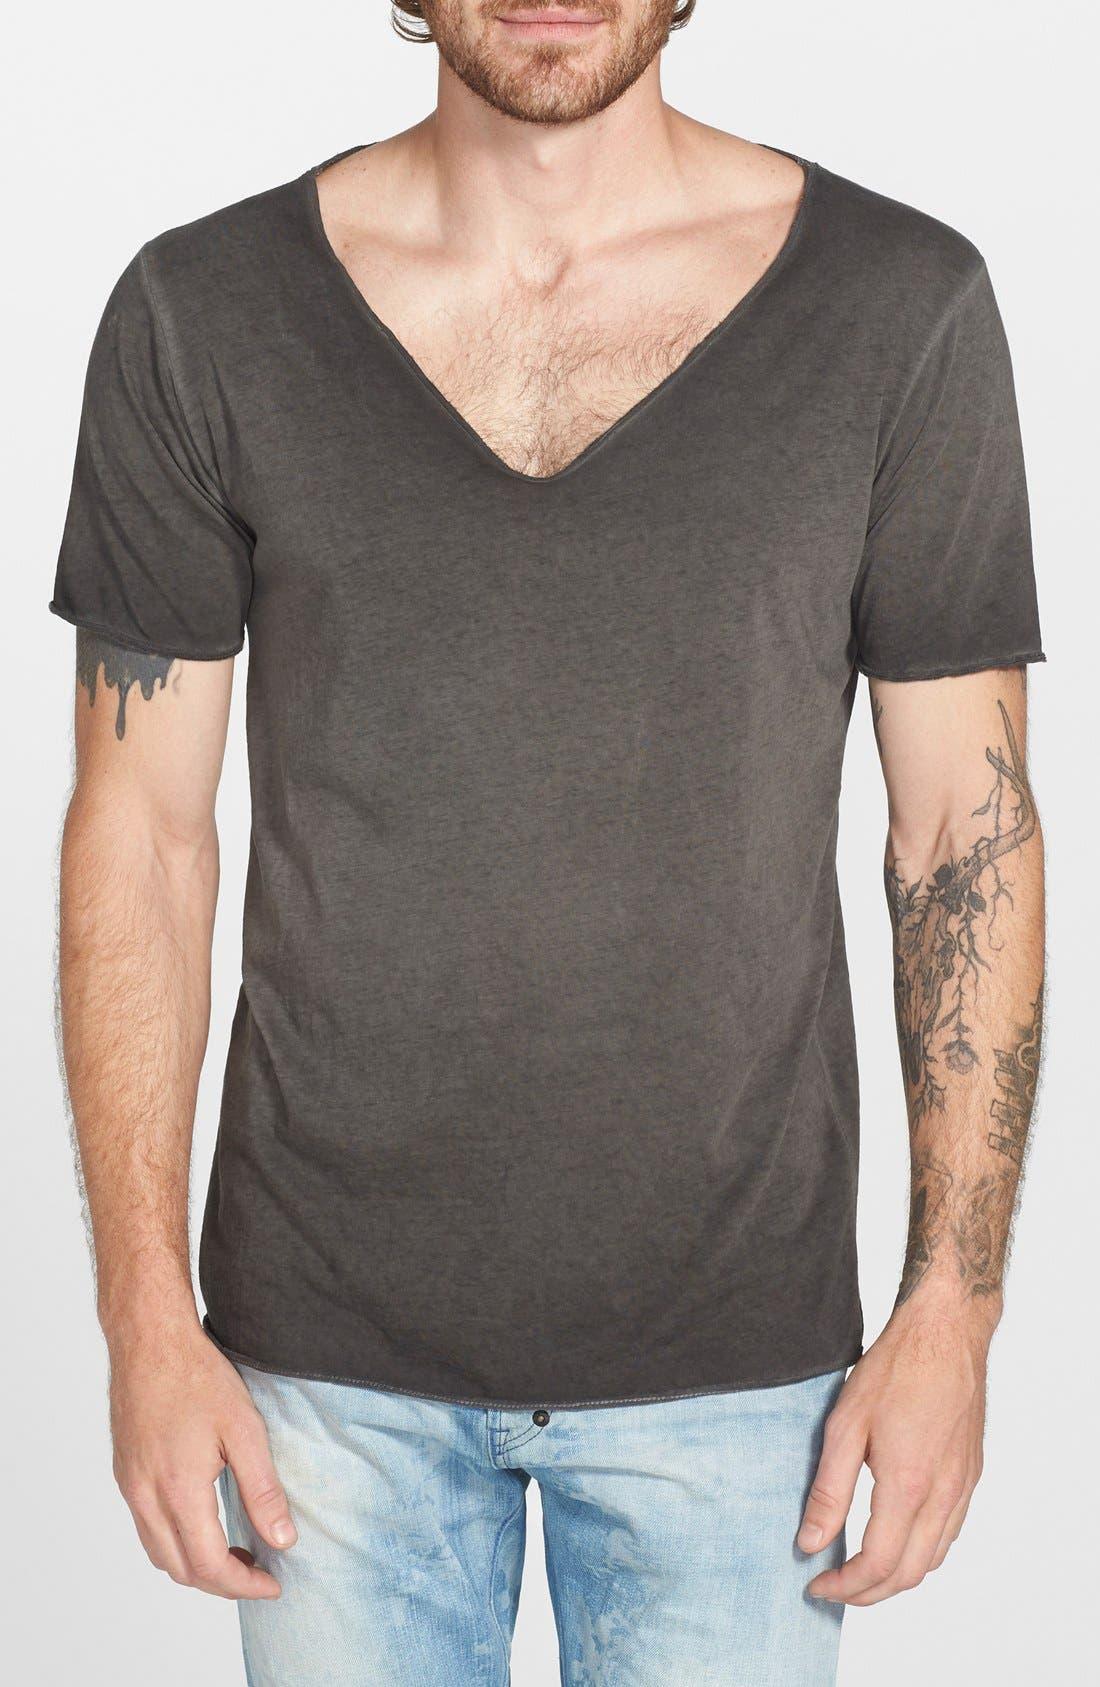 URBAN CAMO BRIGADE,                             Wide V-Neck T-Shirt,                             Main thumbnail 1, color,                             001